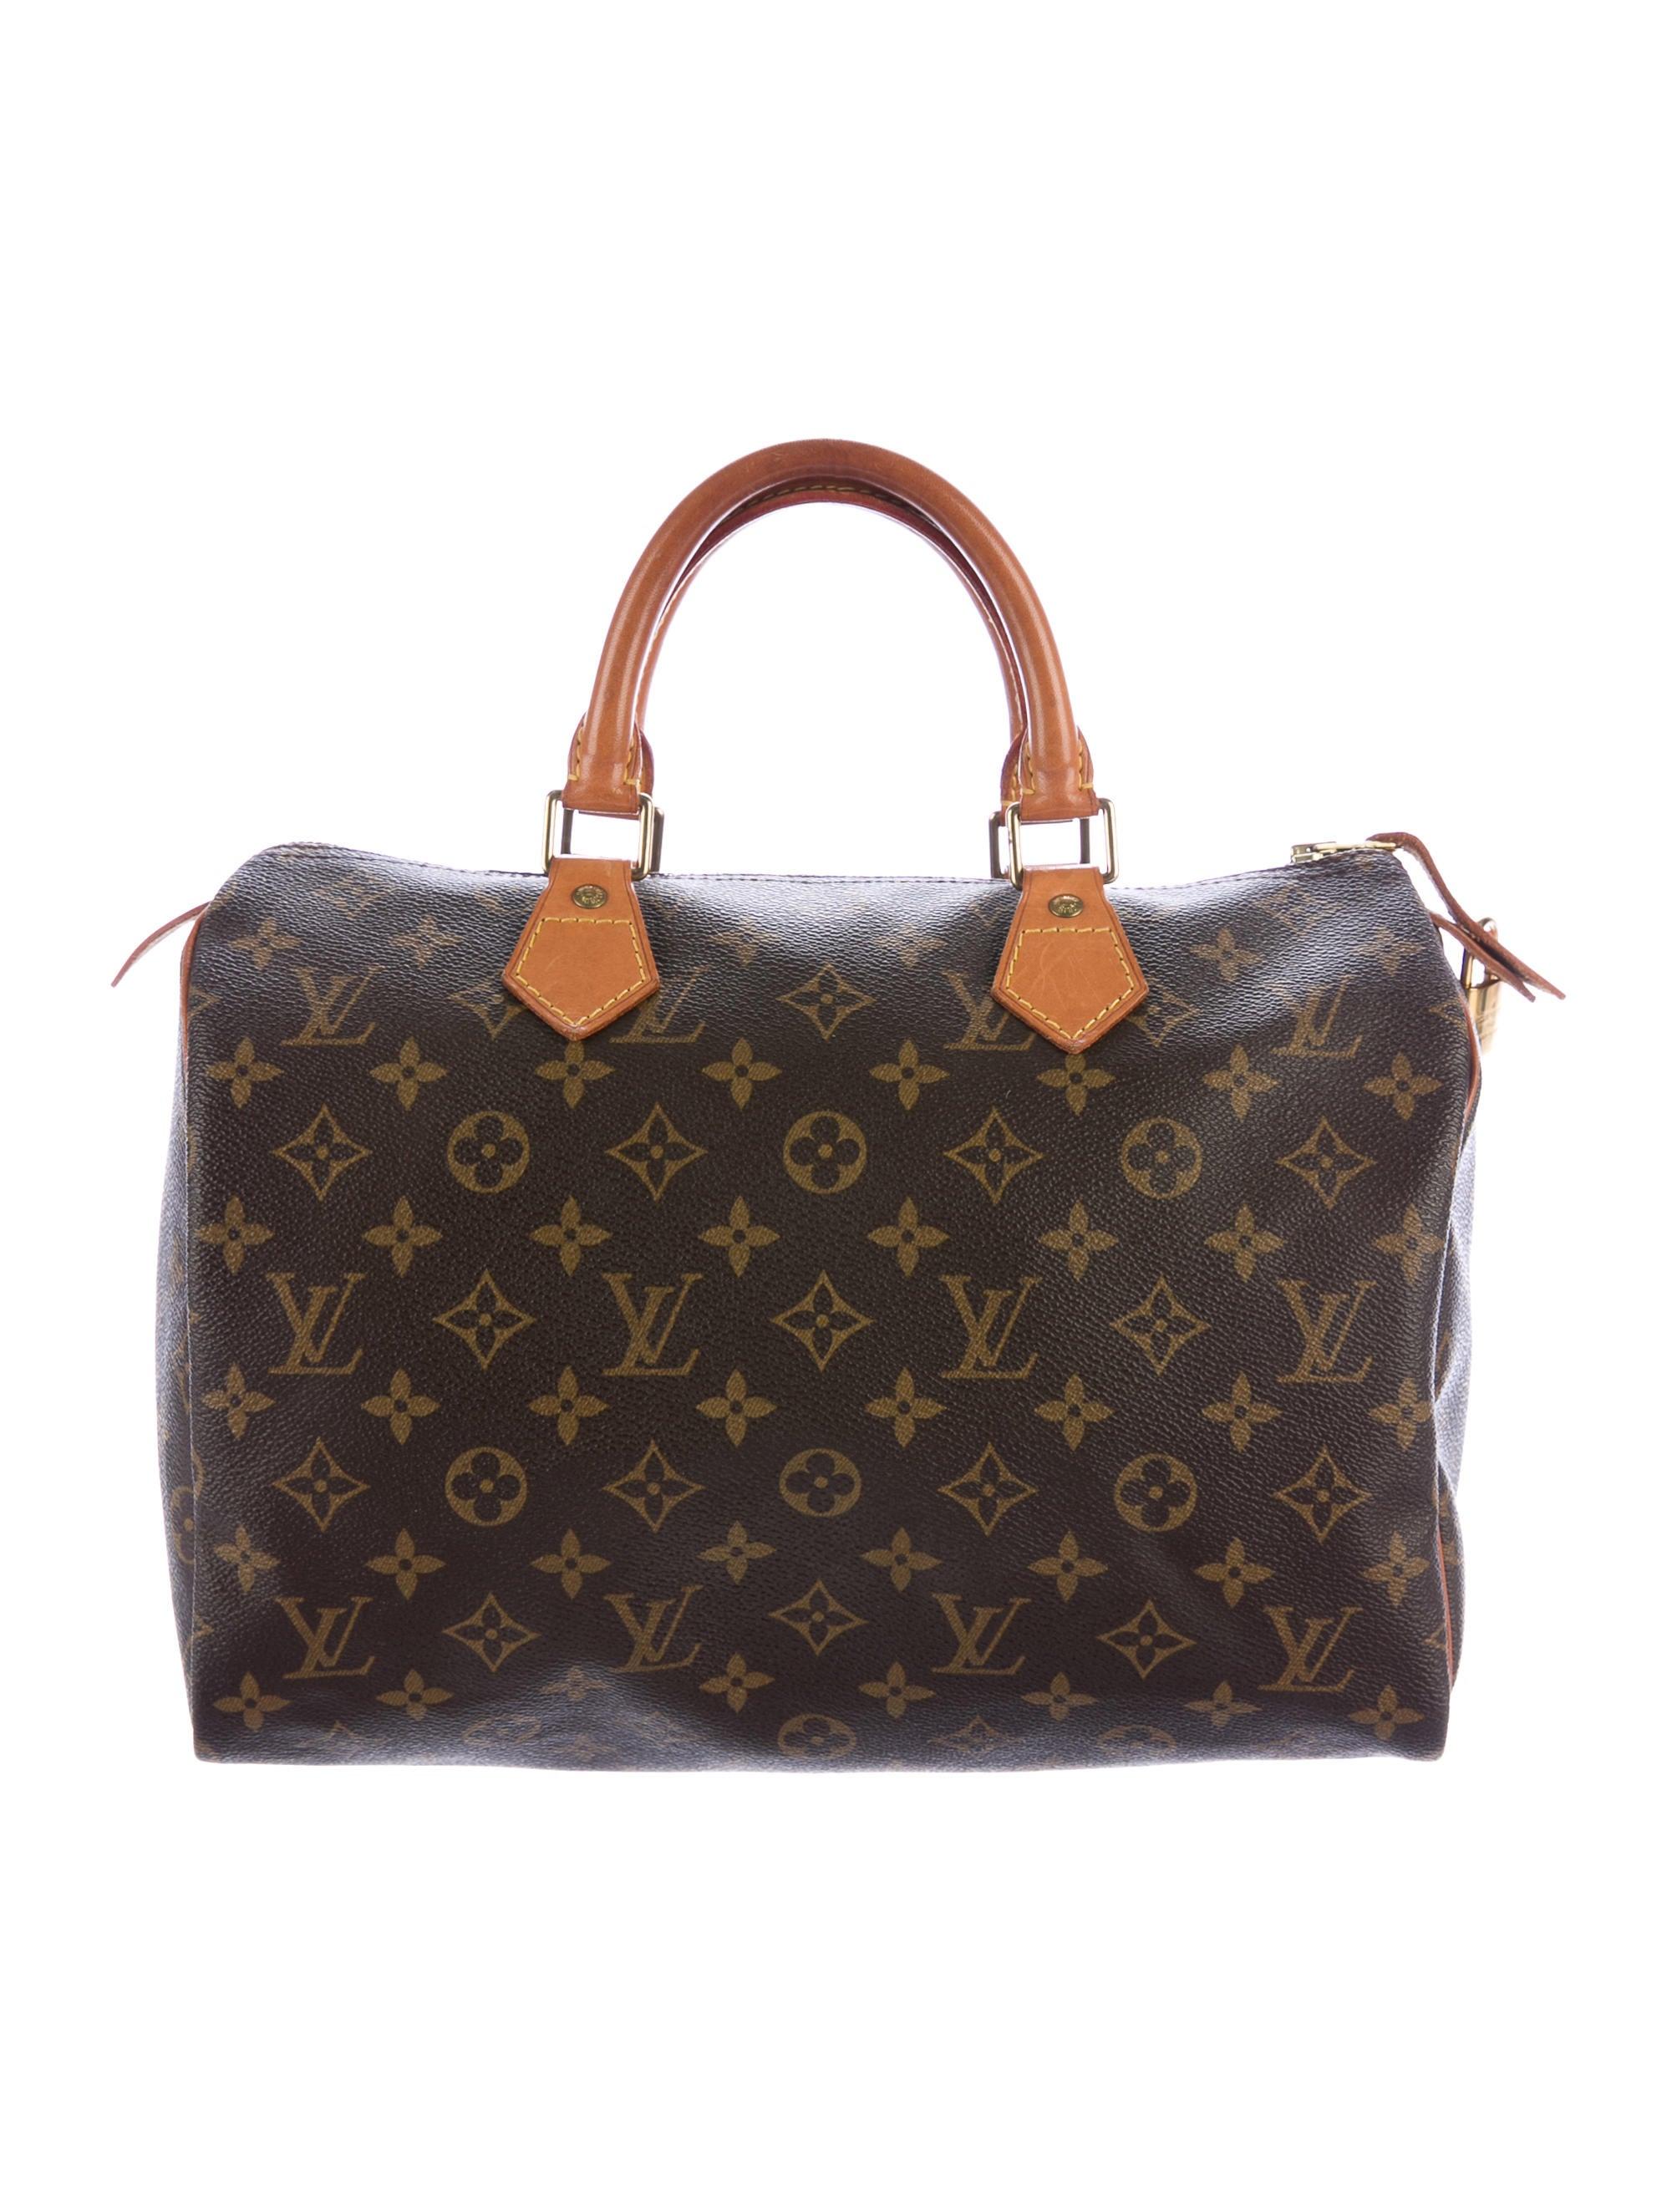 louis vuitton monogram speedy 30 handbags lou122879. Black Bedroom Furniture Sets. Home Design Ideas